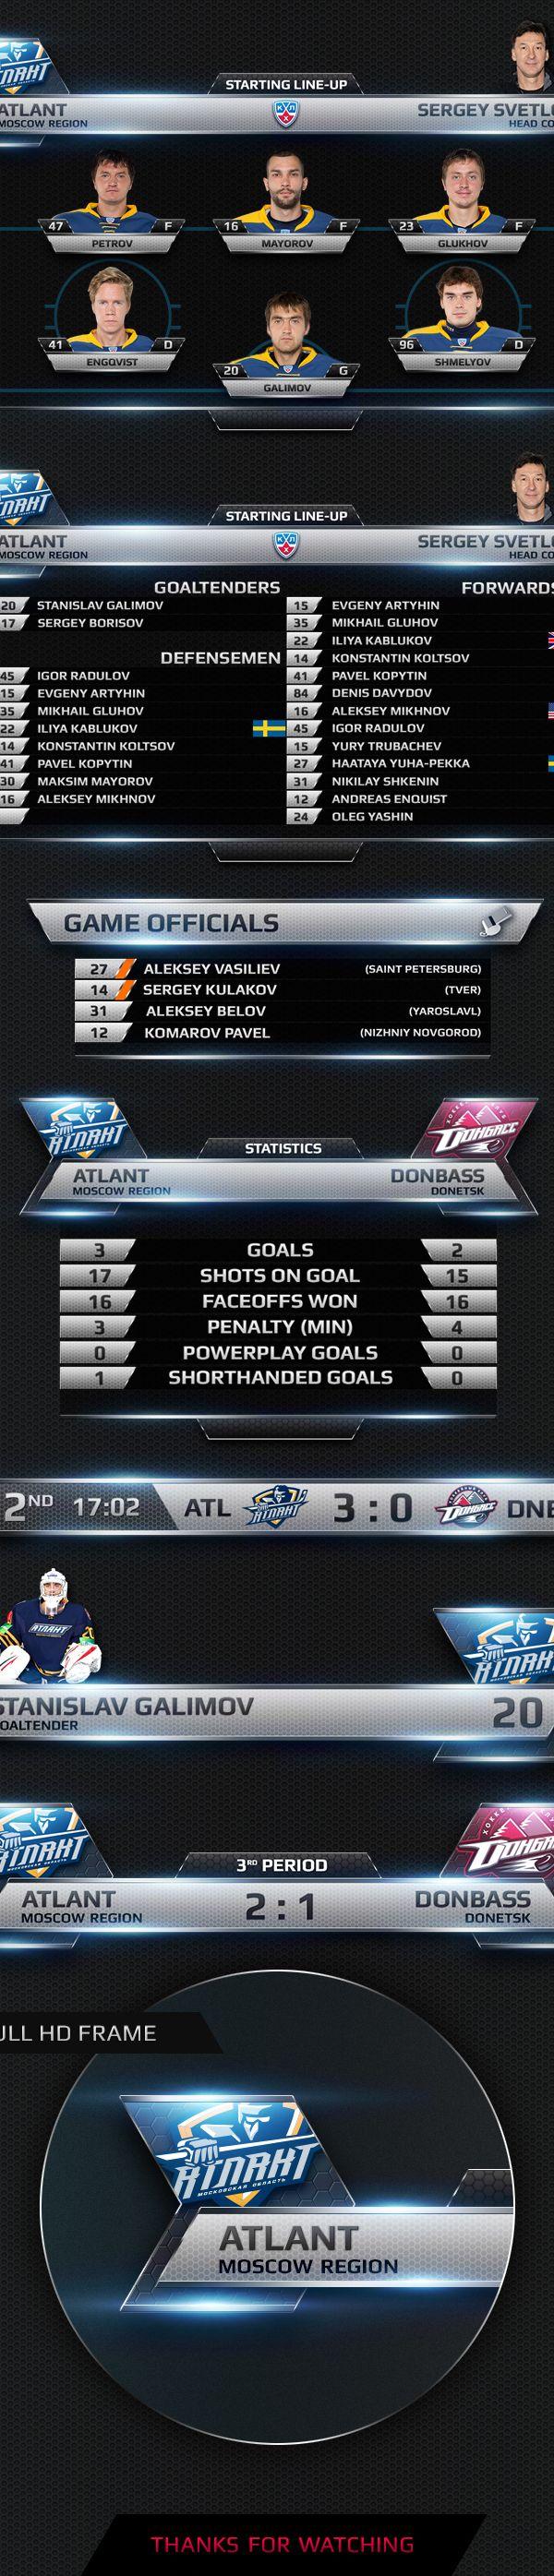 KHL Broadcast Graphics 2013-2014 by Vitaly Cherkasov, via Behance